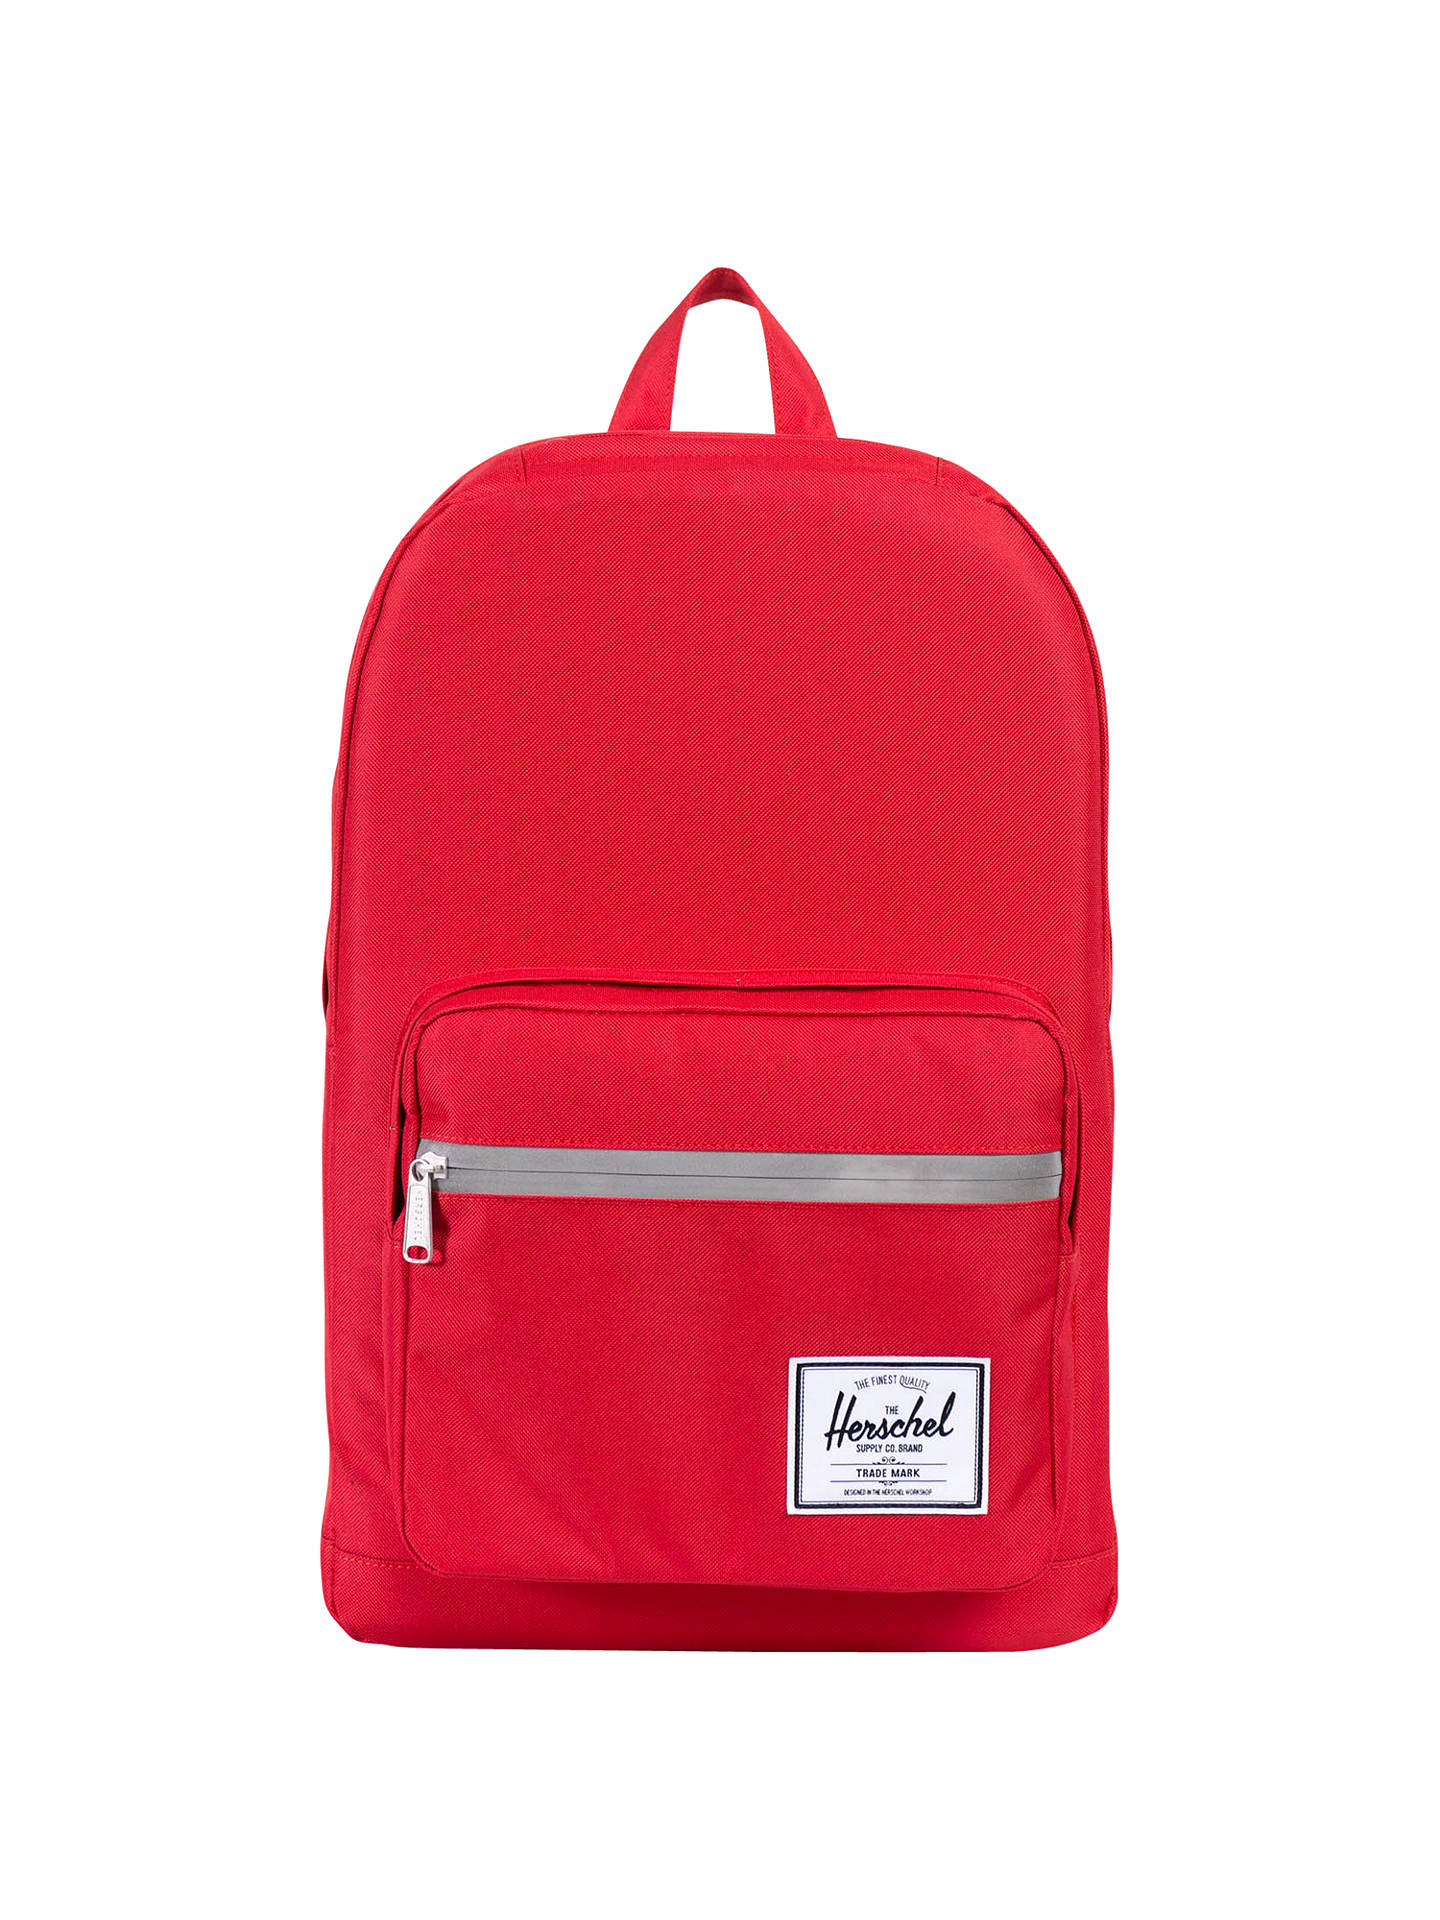 BuyHerschel Supply Co. Pop Quiz Backpack 85b1c25c32e8d